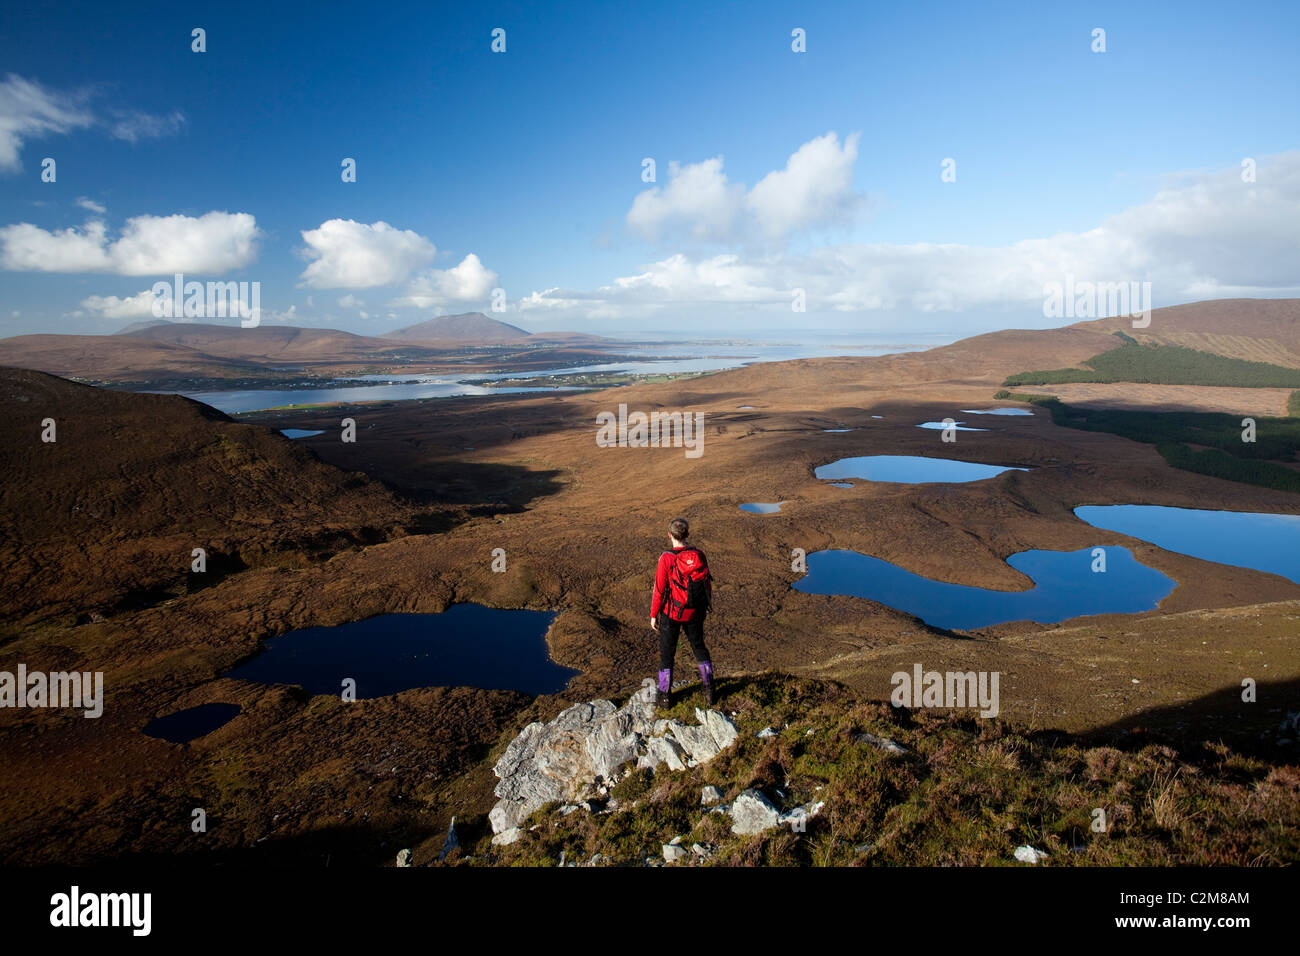 Walker looking towards Achill Island from Corraun Hill, County Mayo, Ireland. - Stock Image